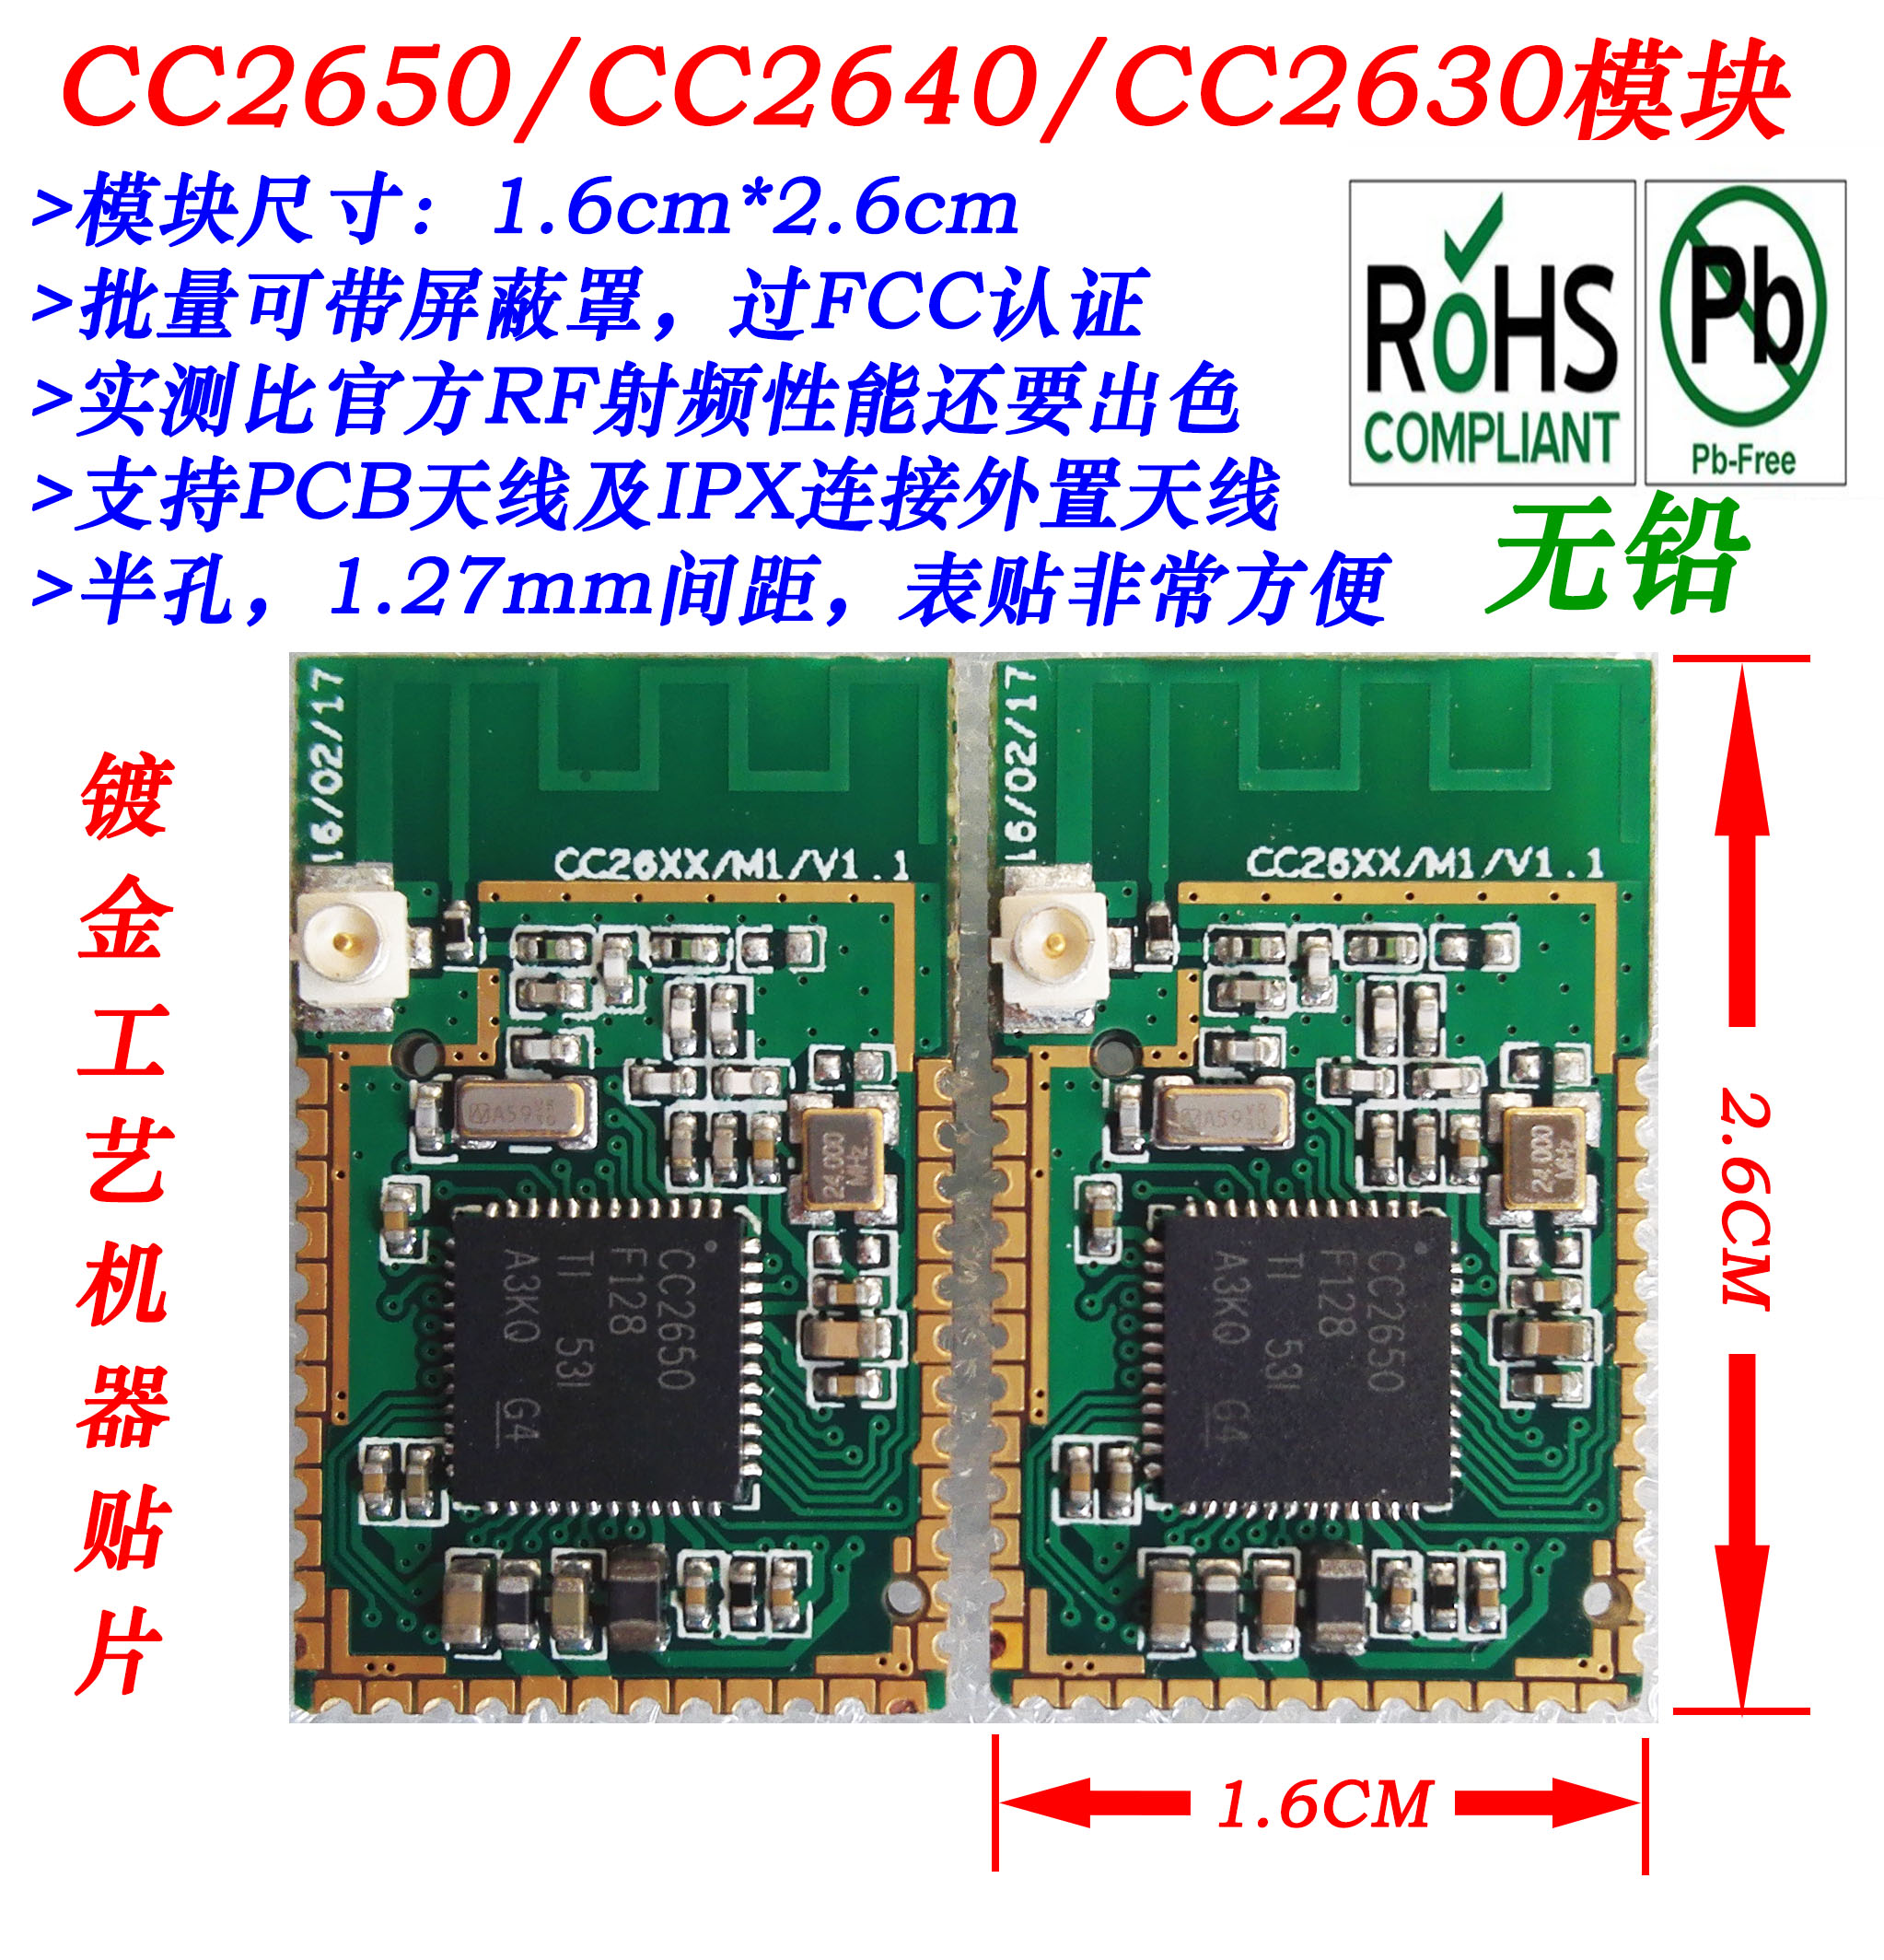 CC2640 CC2630 CC2650 Bluetooth module, ZigBee module, CC2640 module rs485 to zigbee wireless module 1 6 km transmission cc2630 chip